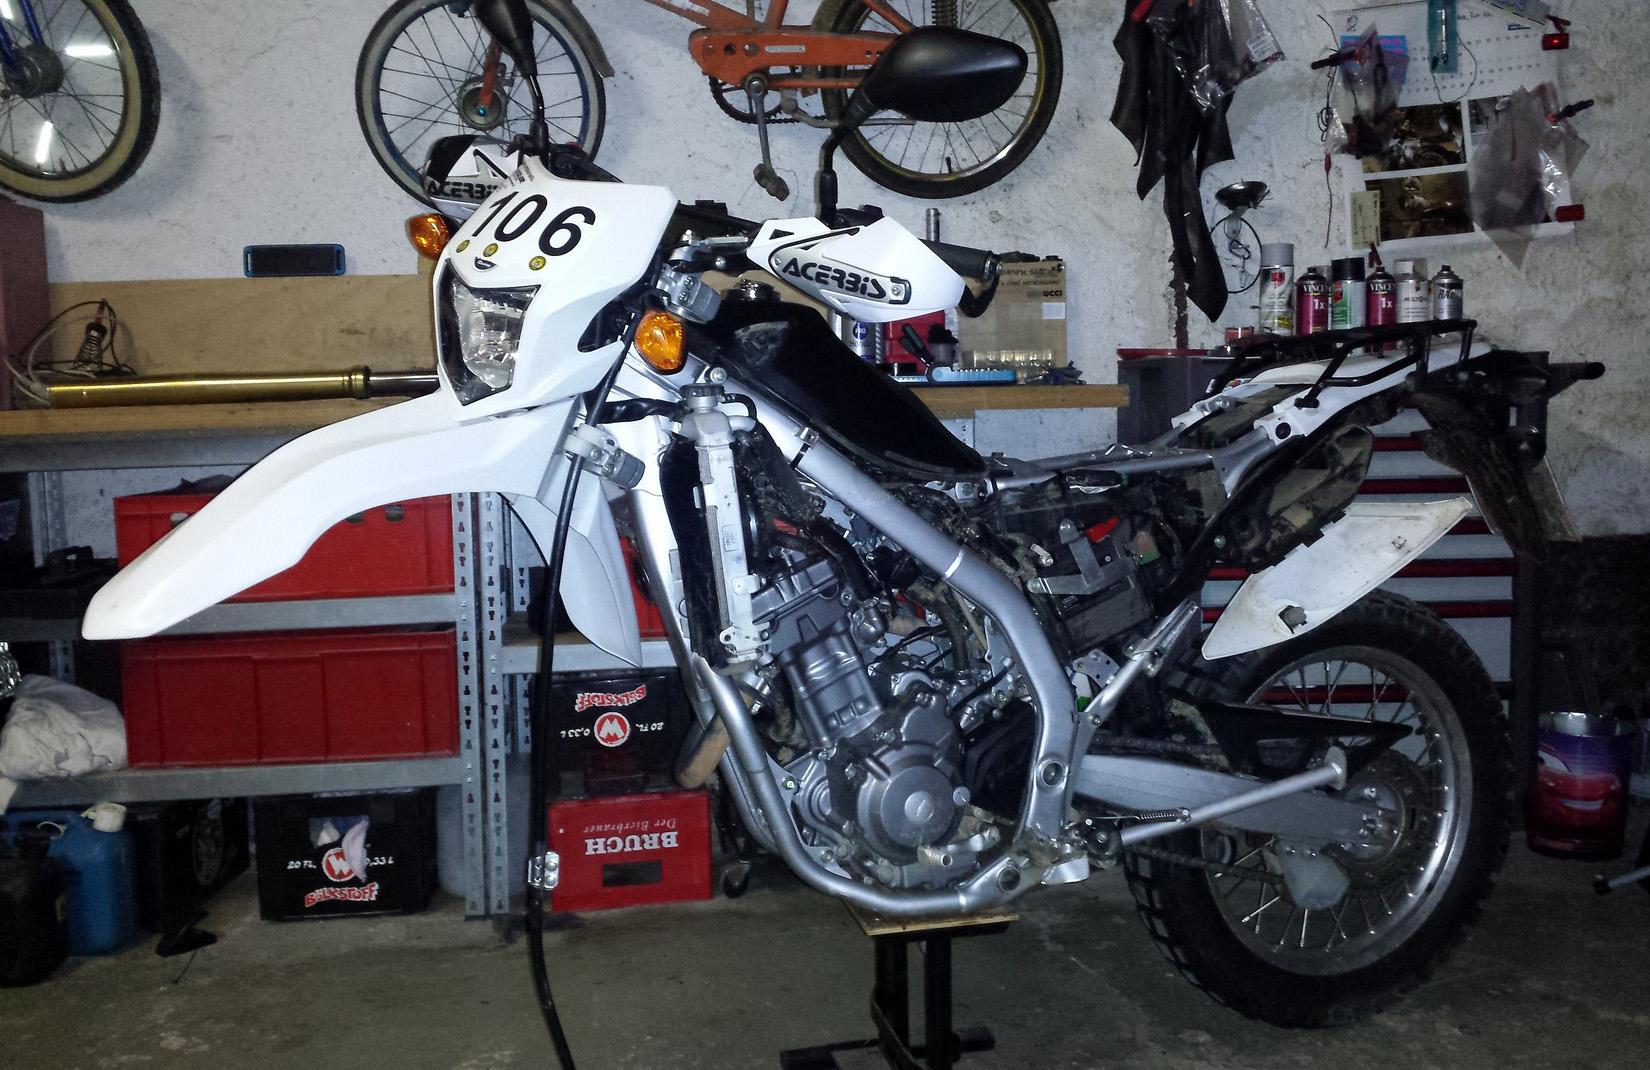 Honda CRF 250l - Gabel ausbauen